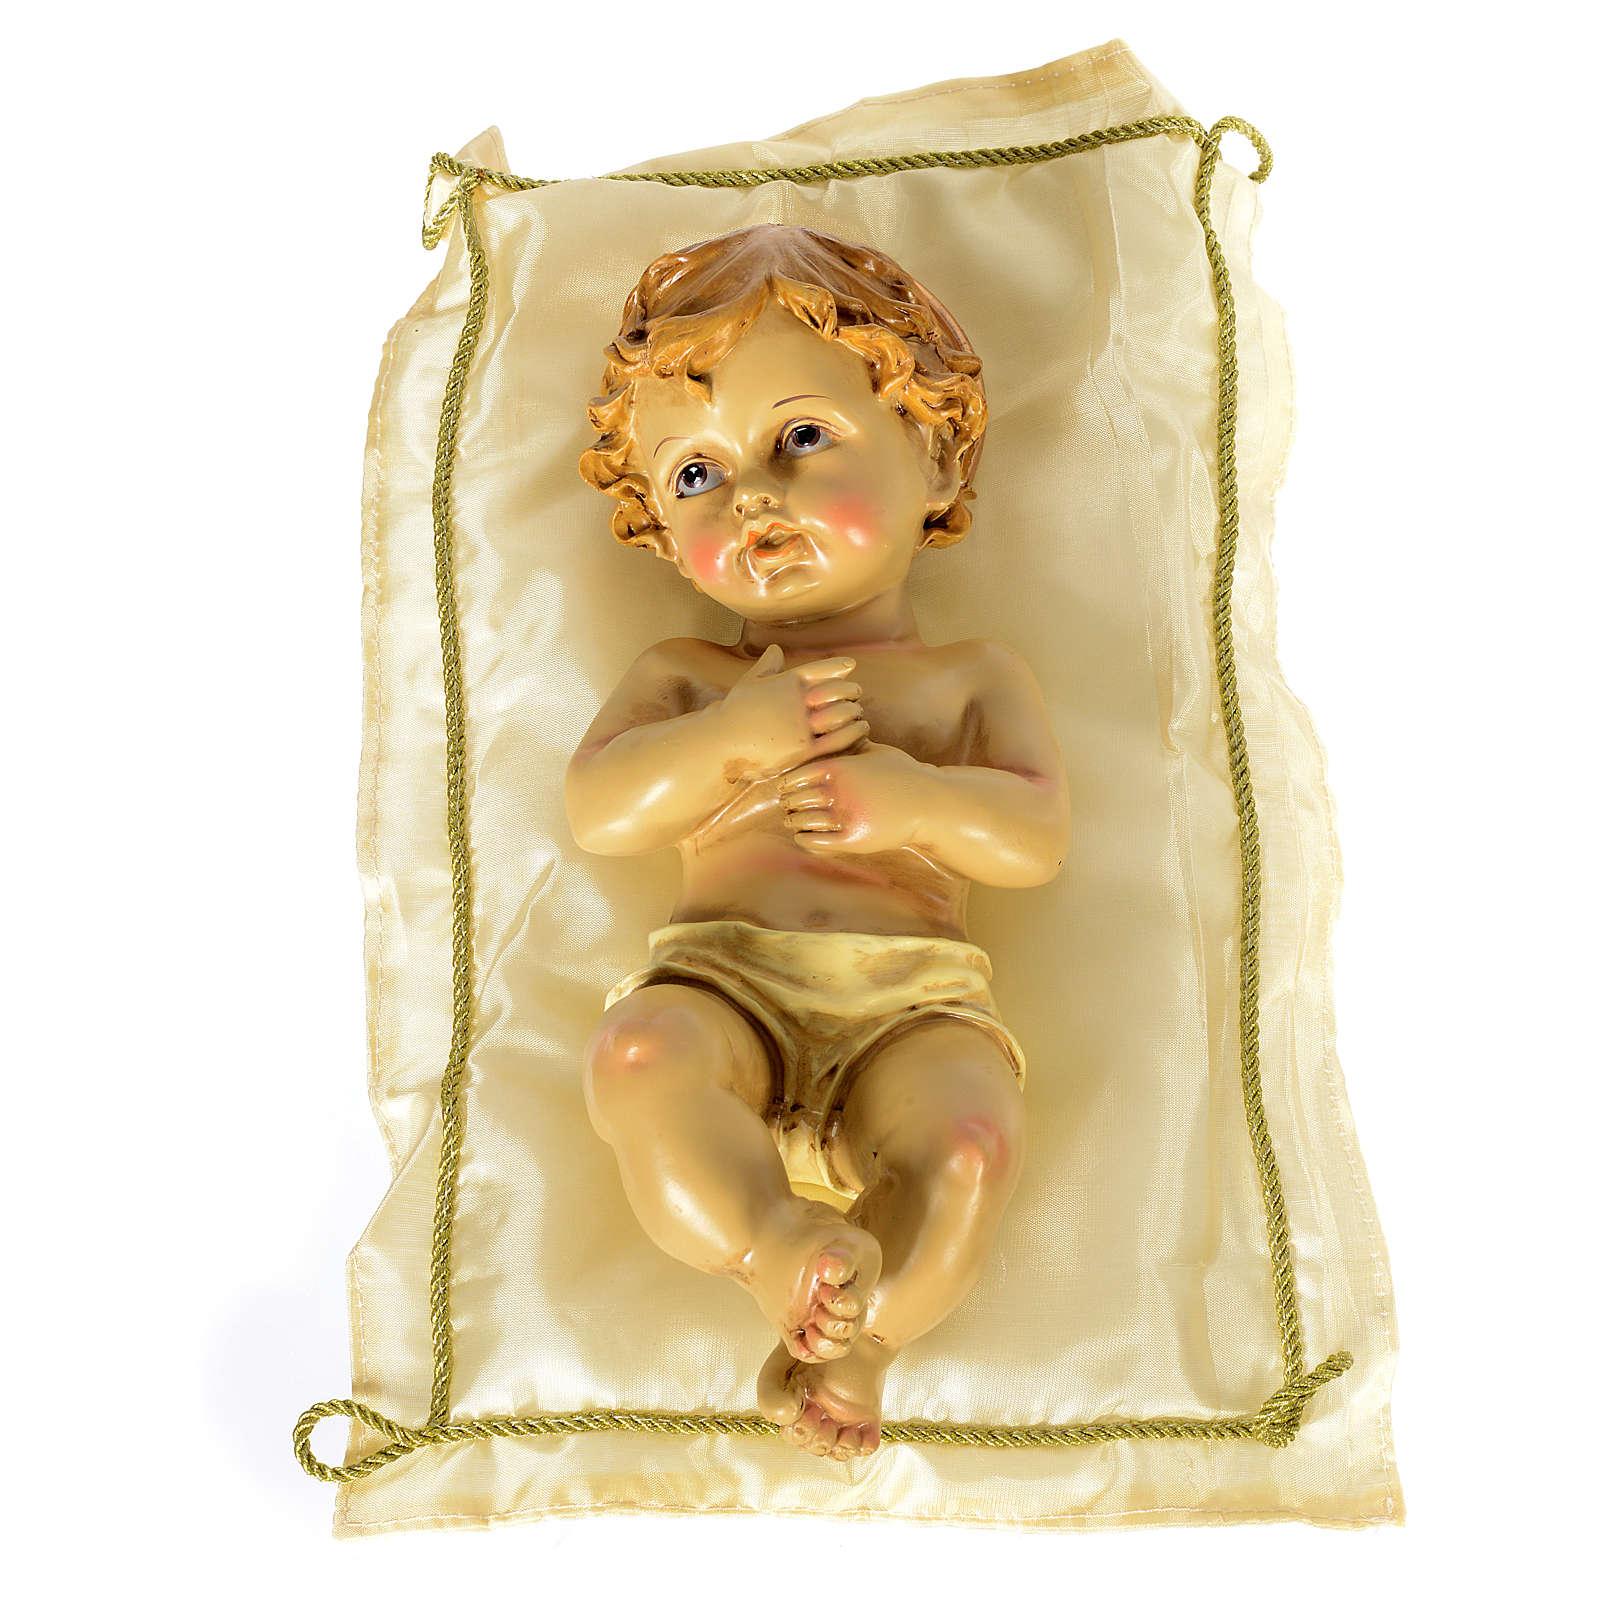 Bambinello con cuscino e aureola altezza 25 cm resina 3